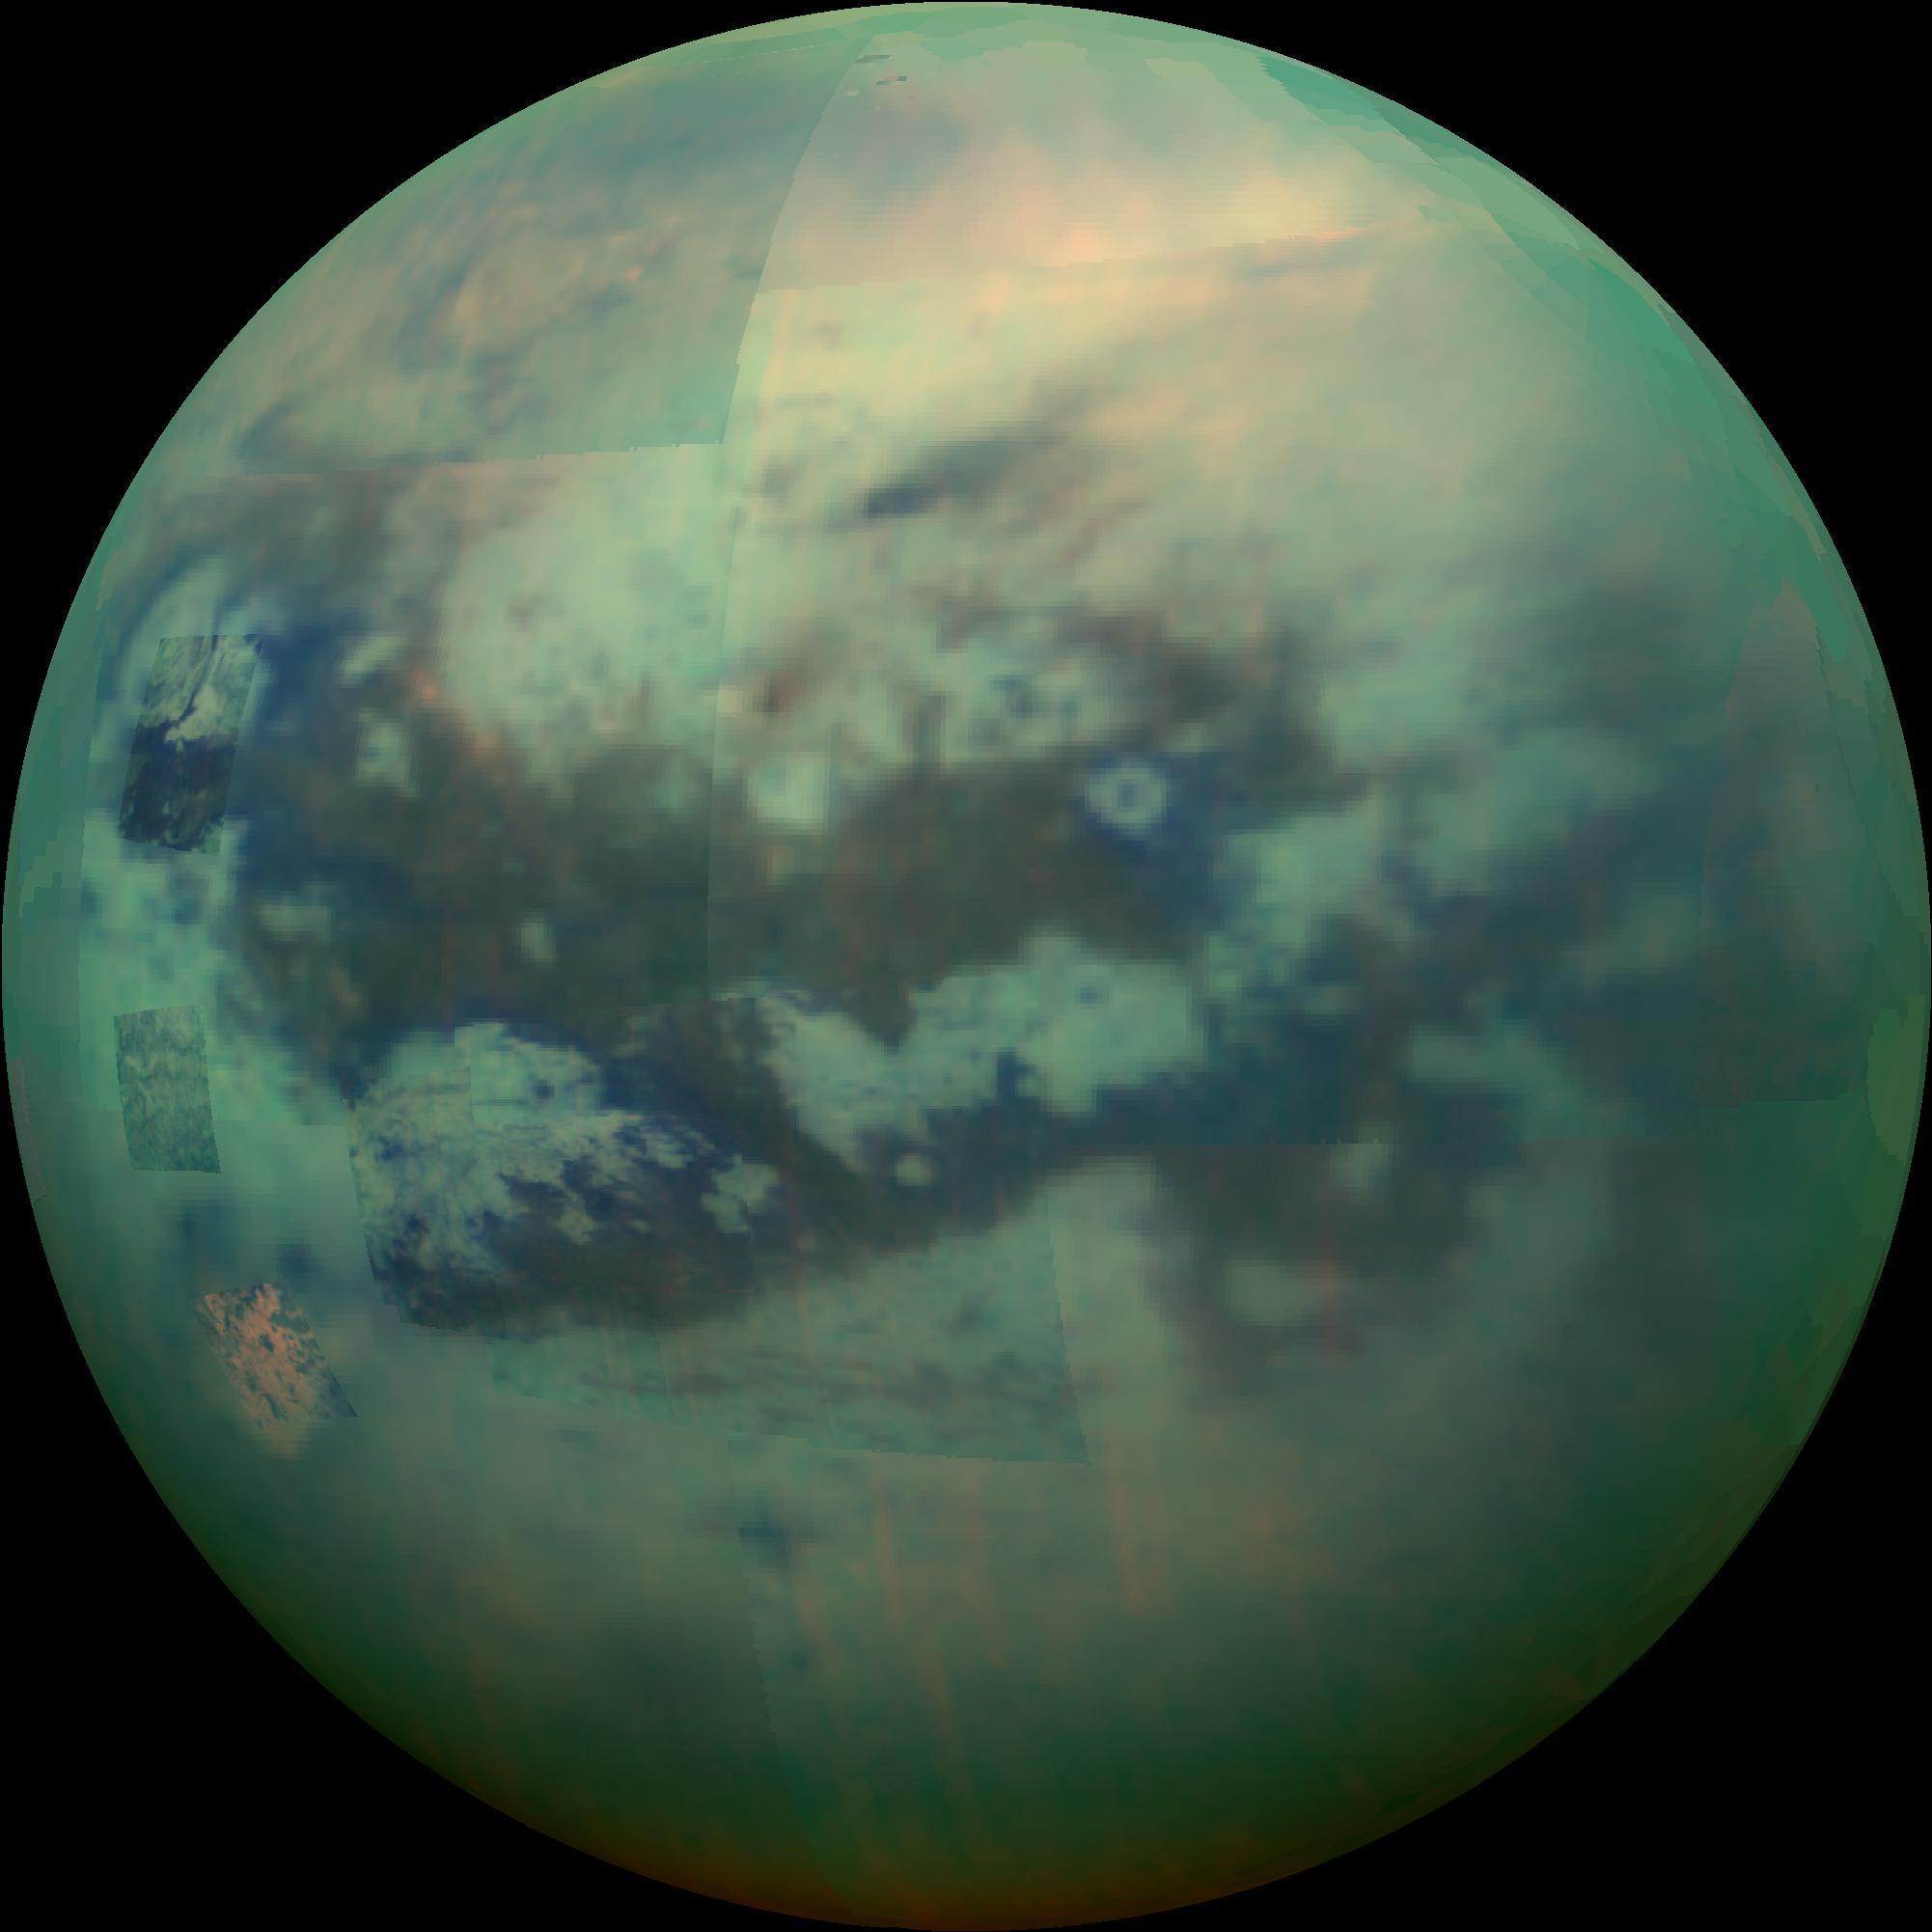 Метановые реки и ацетиленовые берега Титана